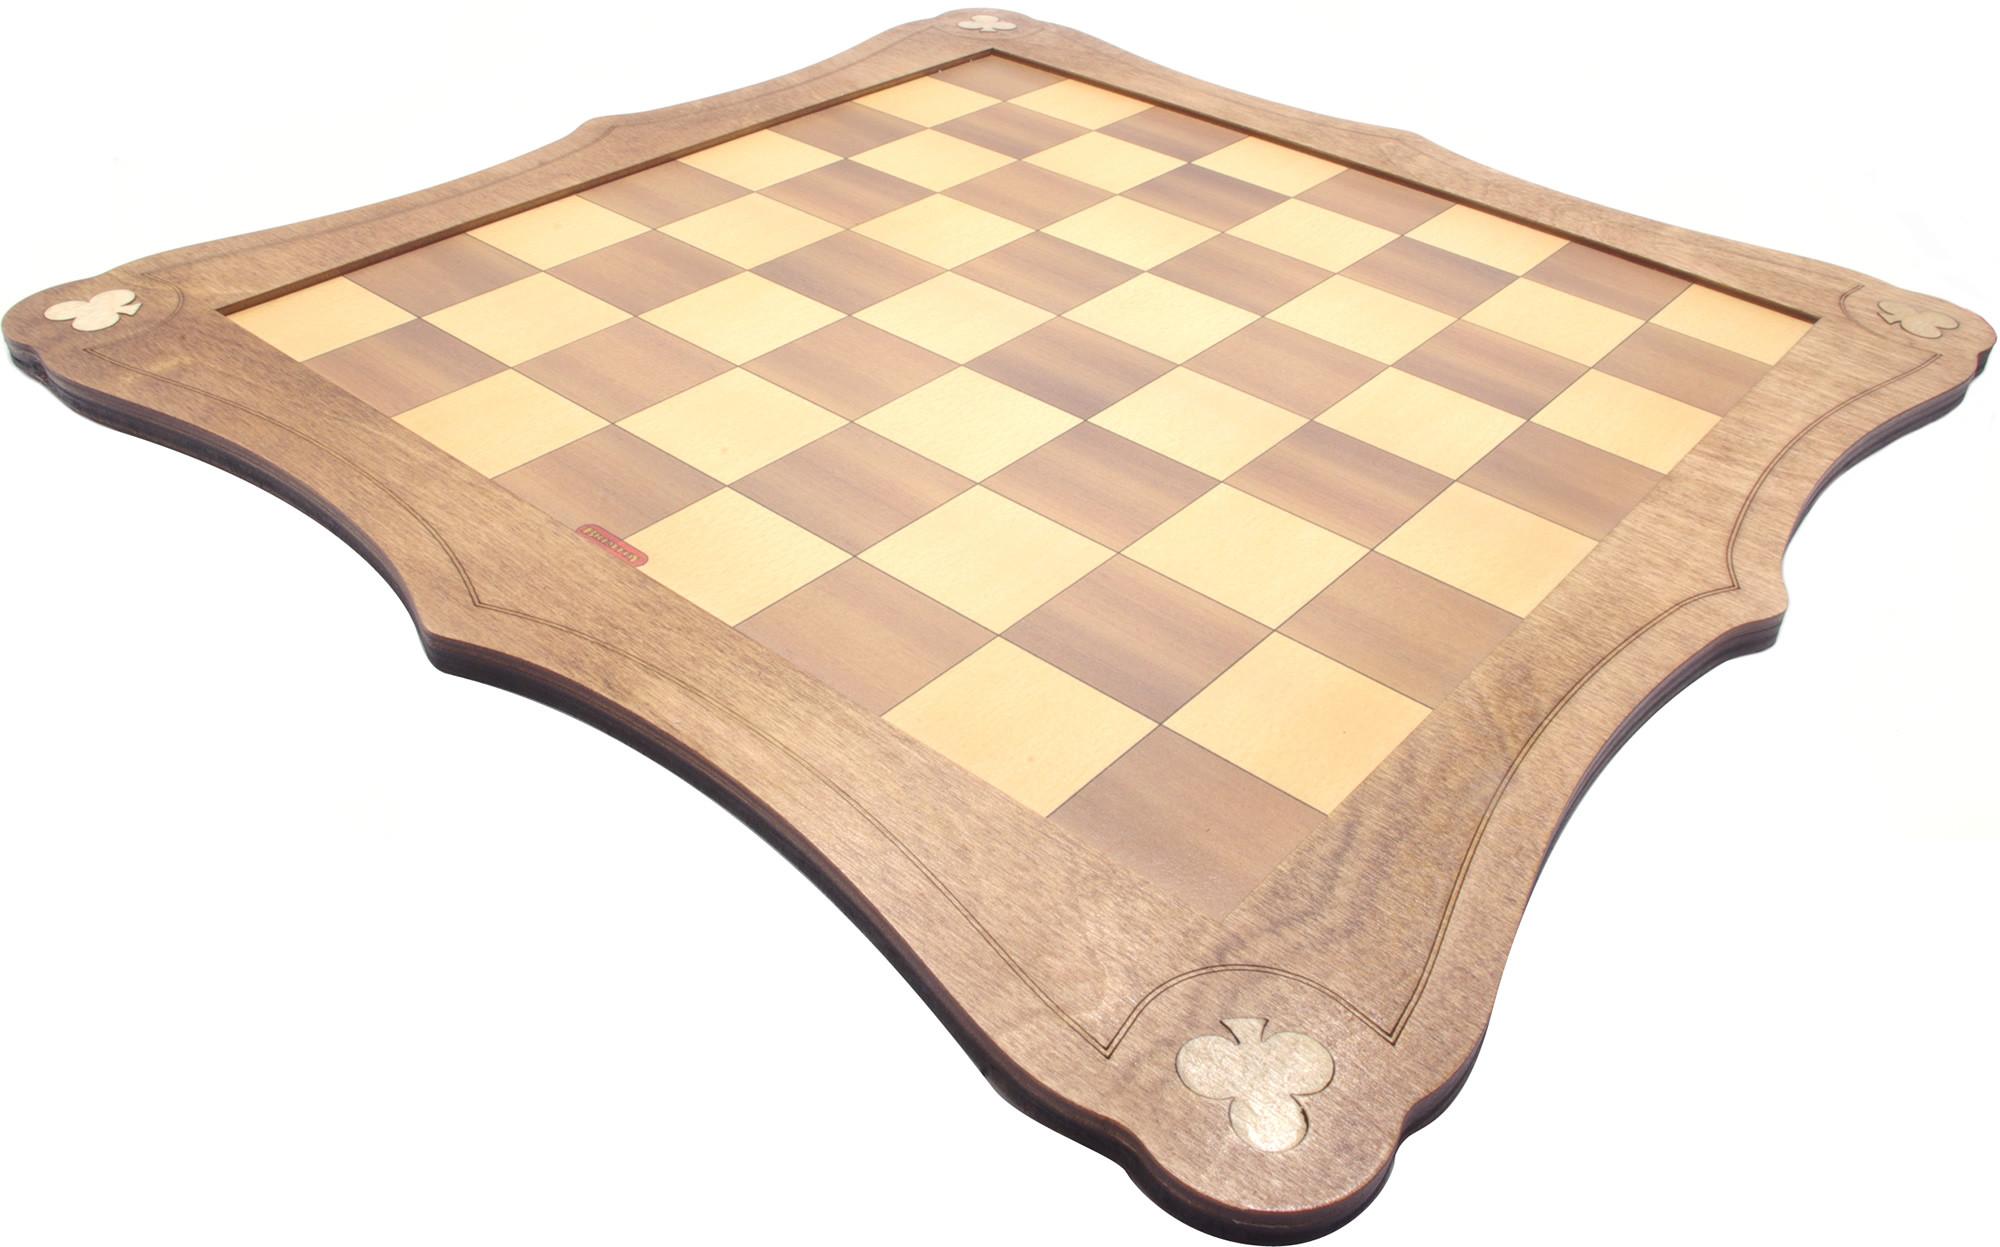 Wooden Chess board - 40 x 40cm